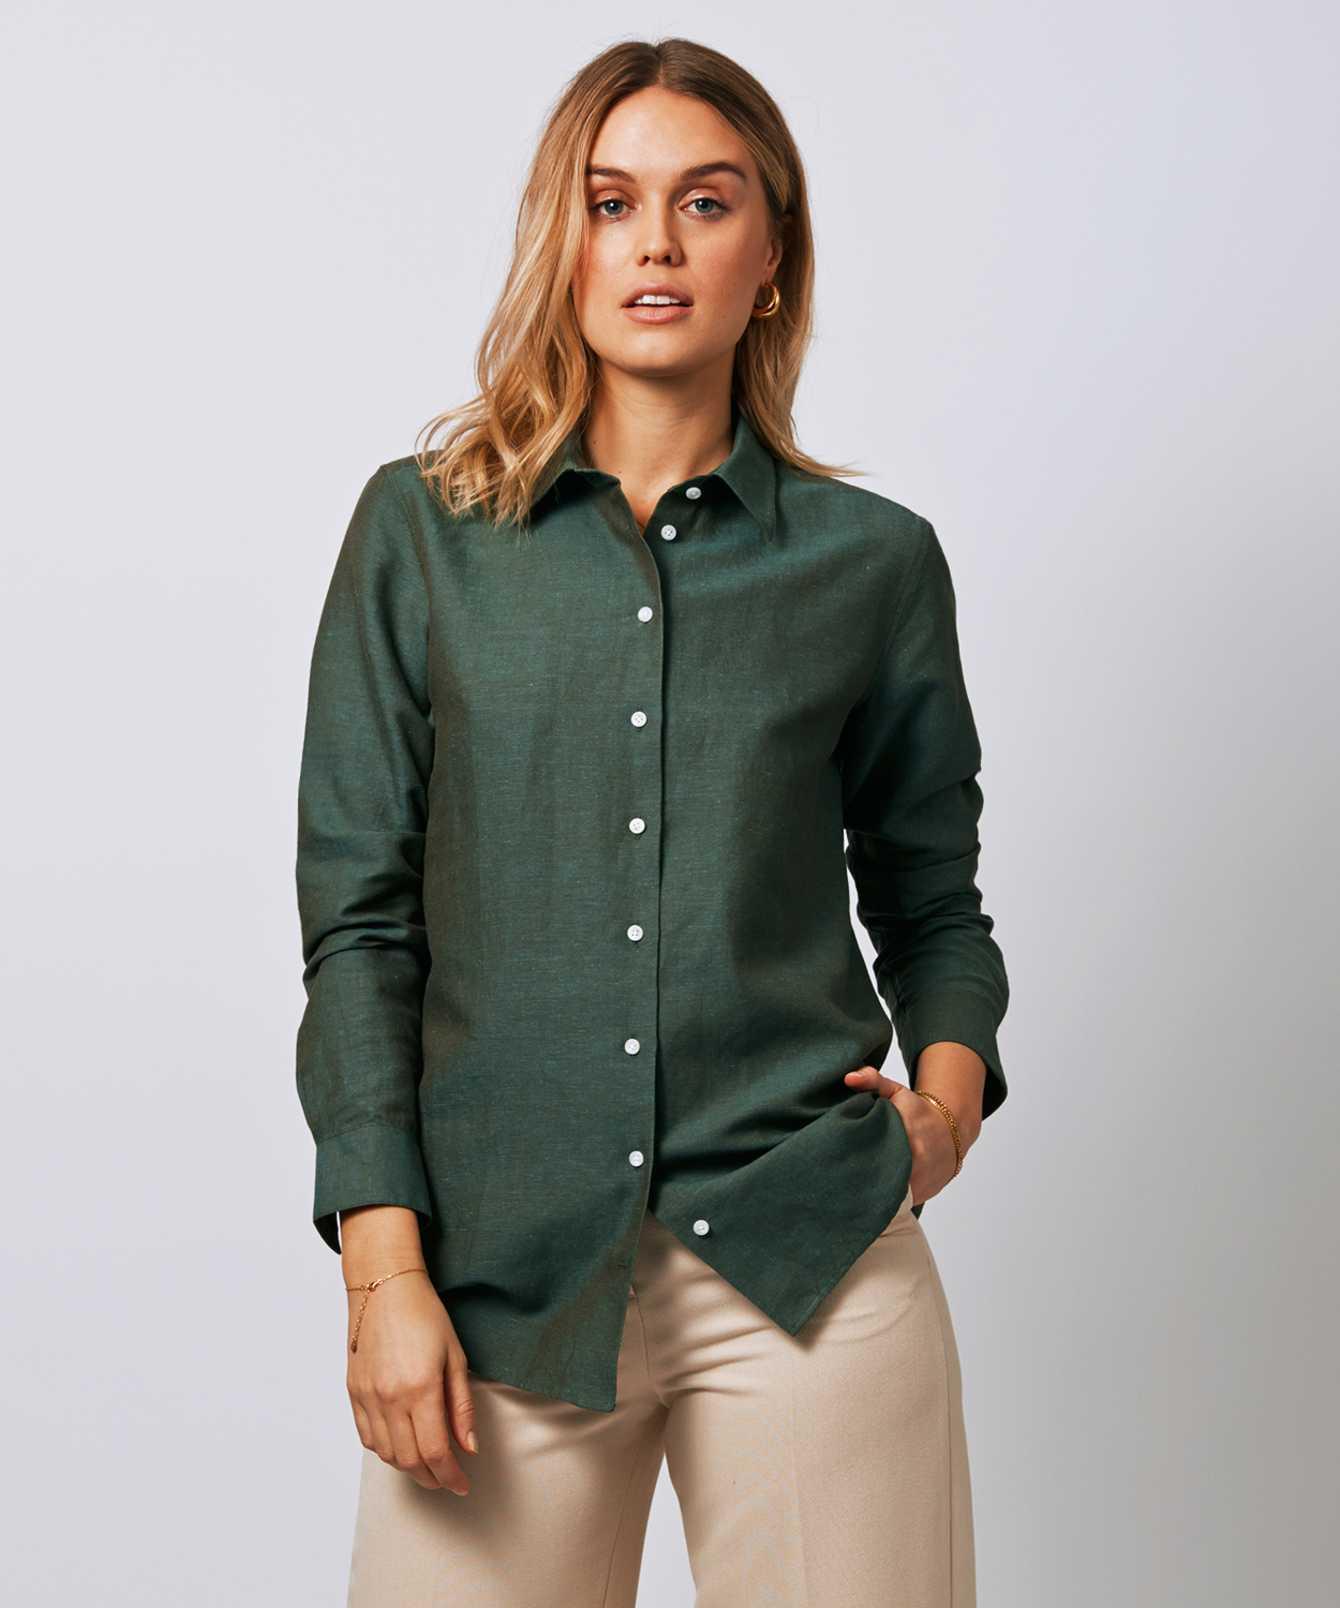 Skjorta Mickan Portofino Grön The Shirt Factory